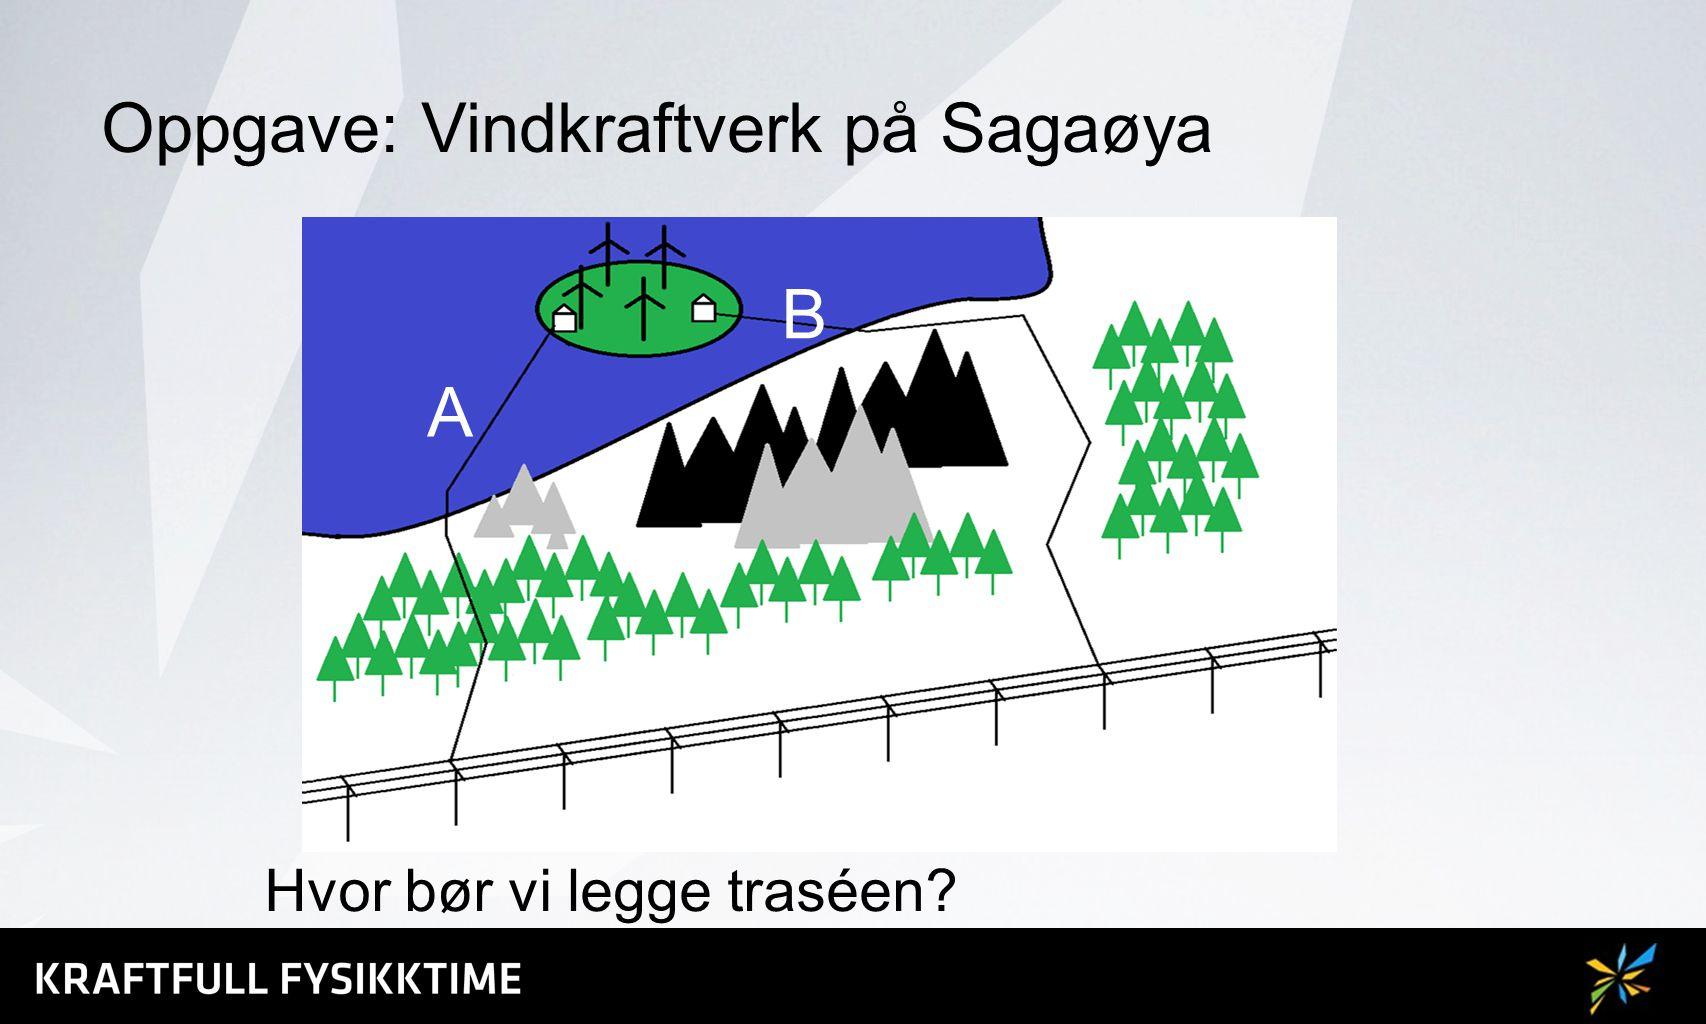 Oppgave: Vindkraftverk på Sagaøya